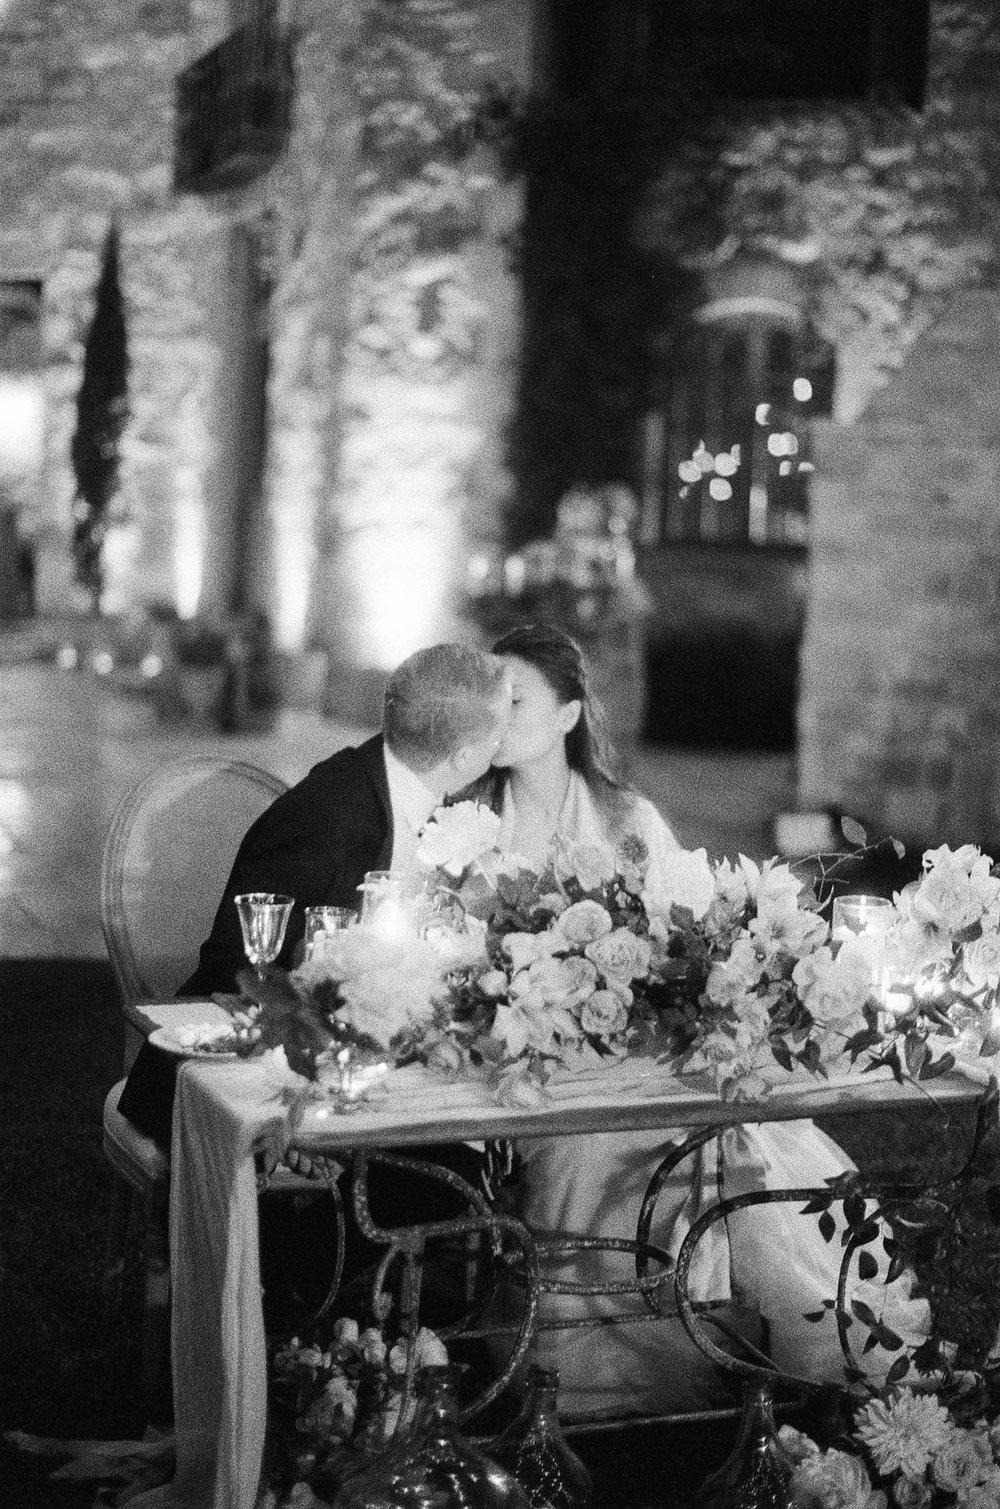 sunstone-villa-wedding-40-Jen_Huang-RD-198-Jen_Huang-000010430034.jpg